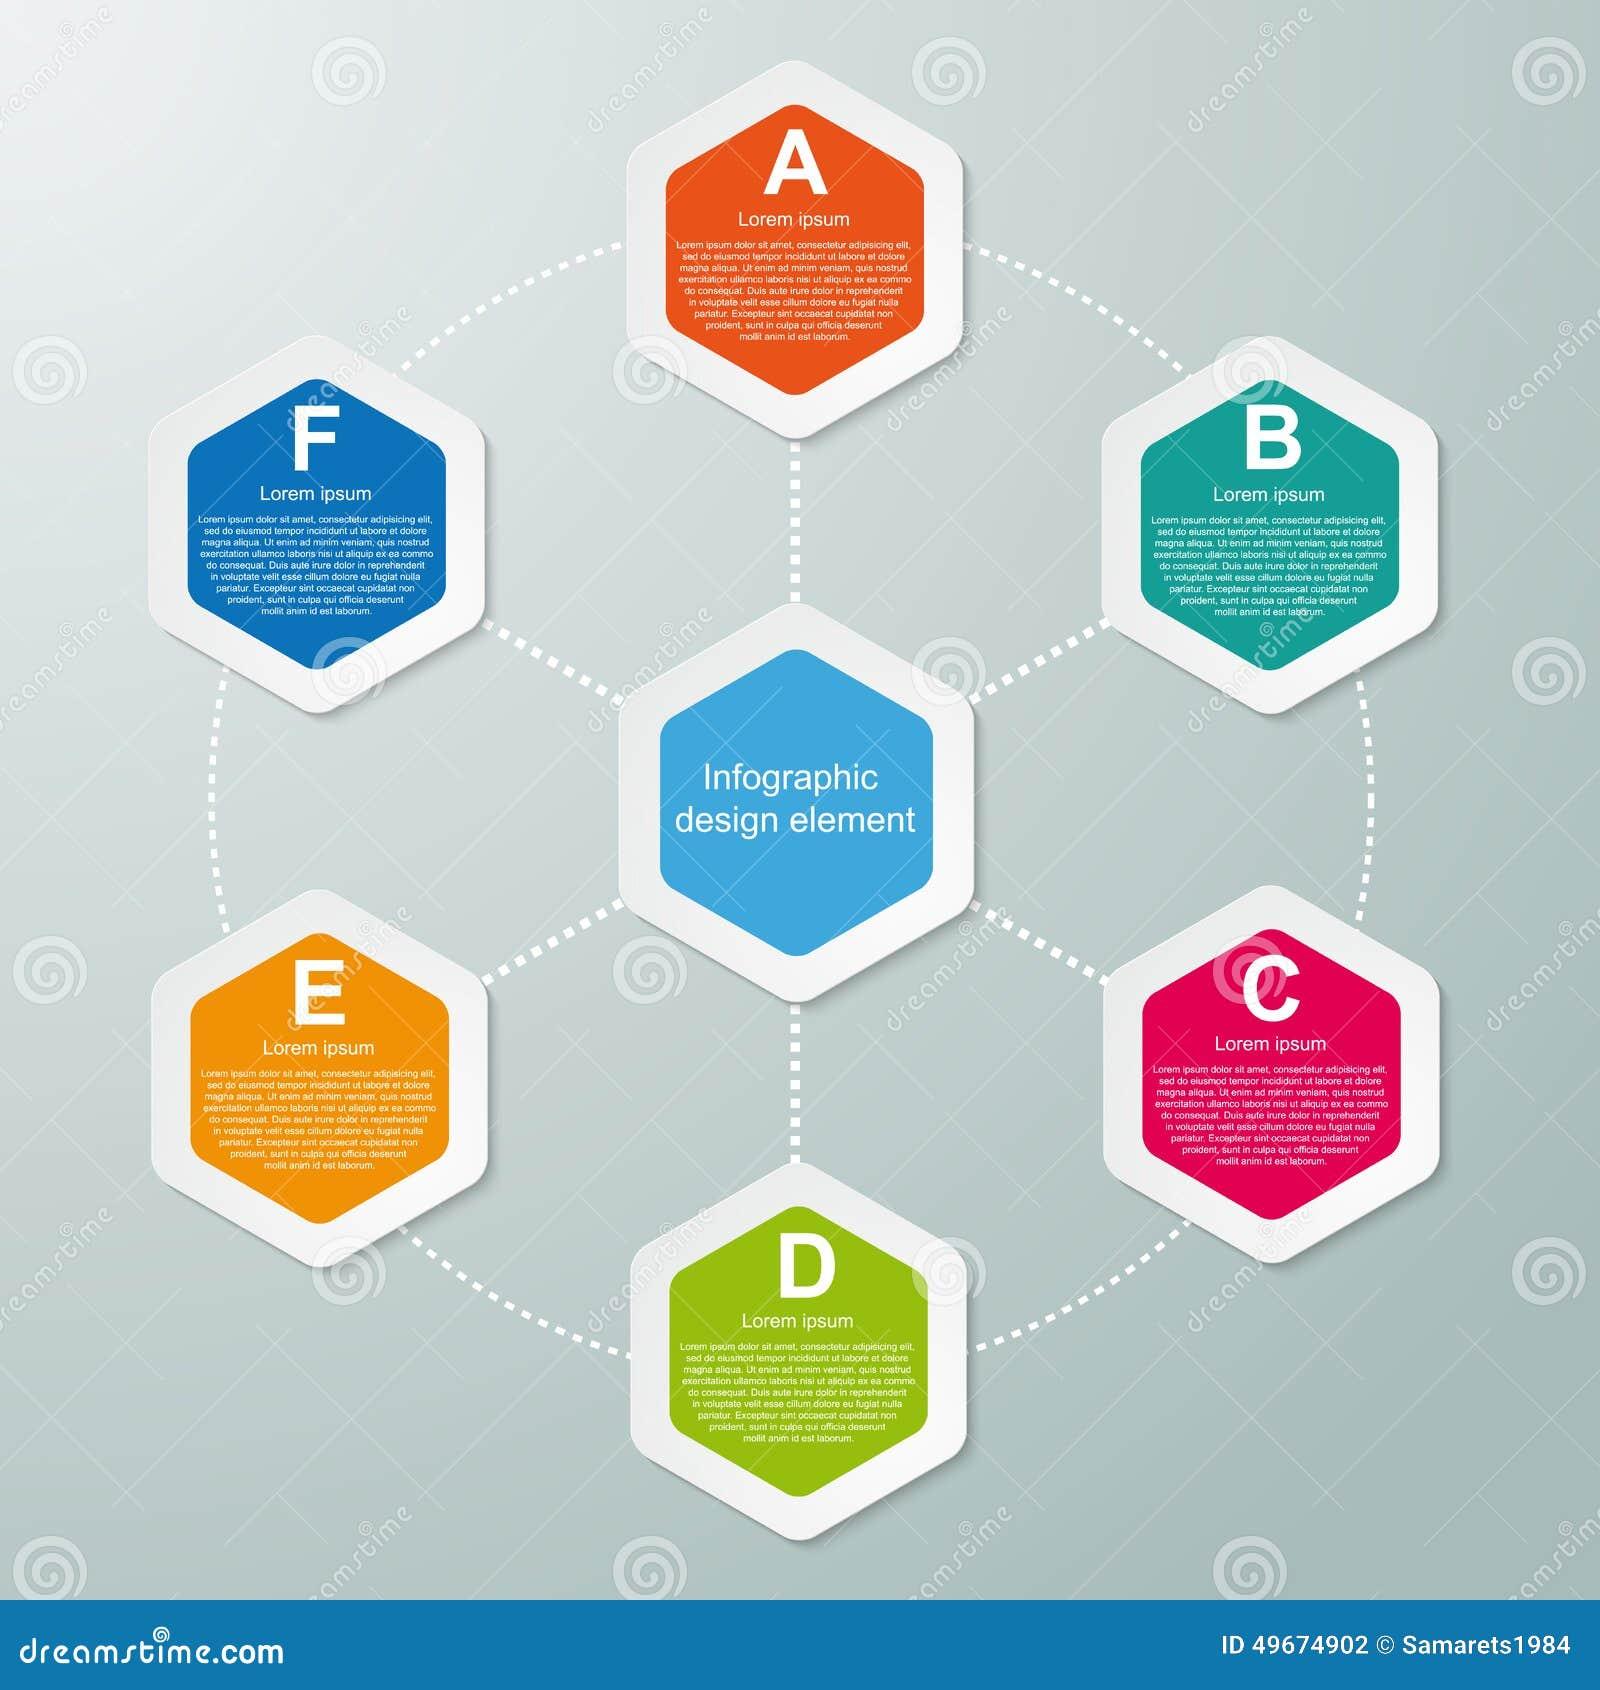 Hexagon graphic design